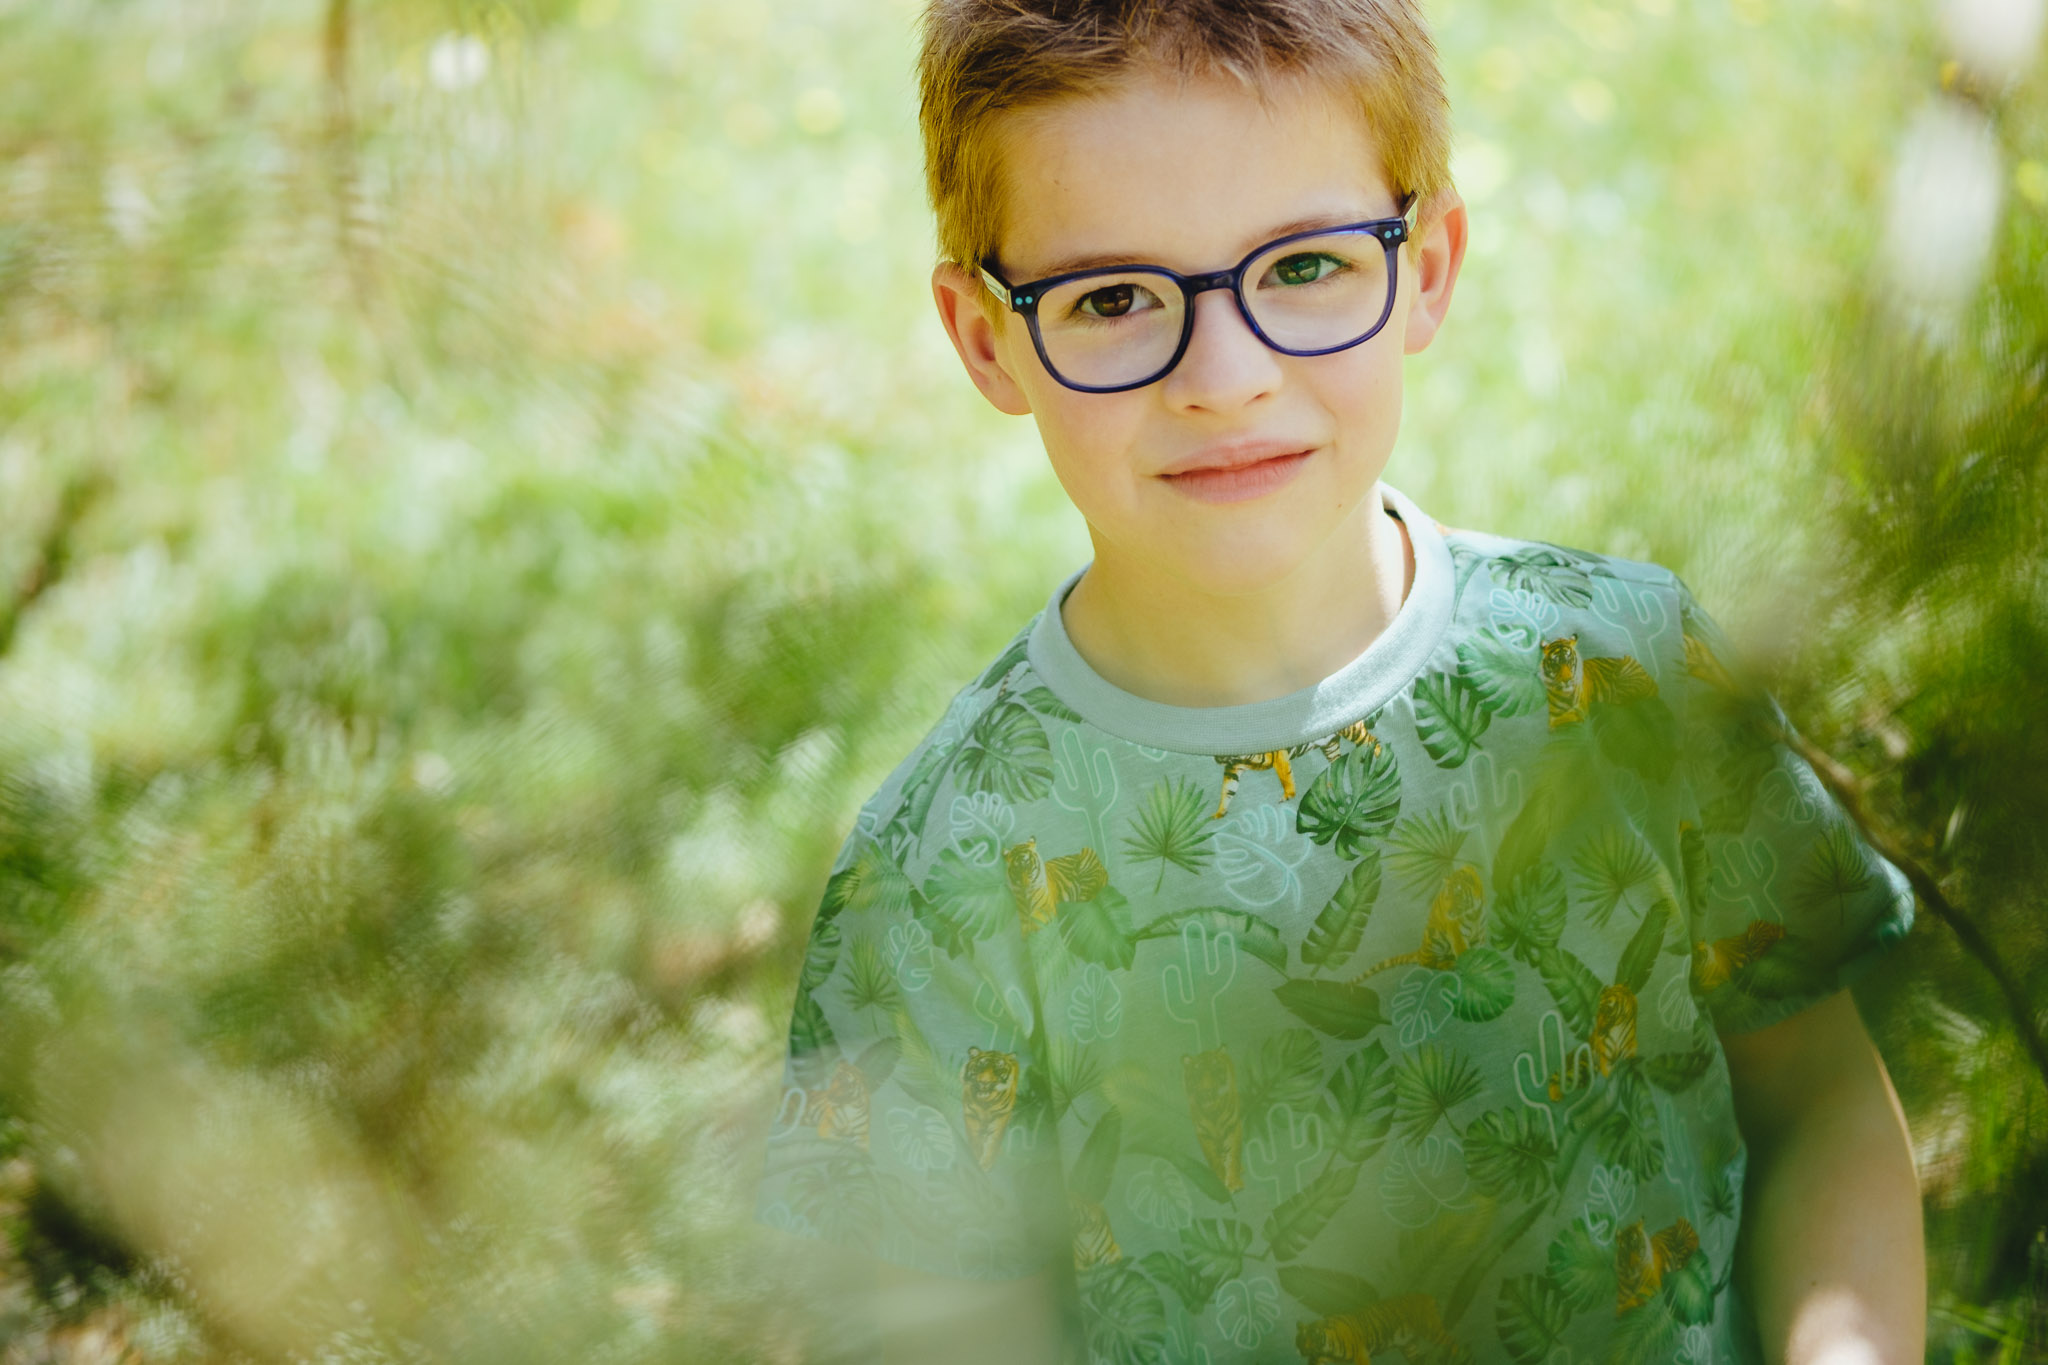 leuk spontaan portret jongen